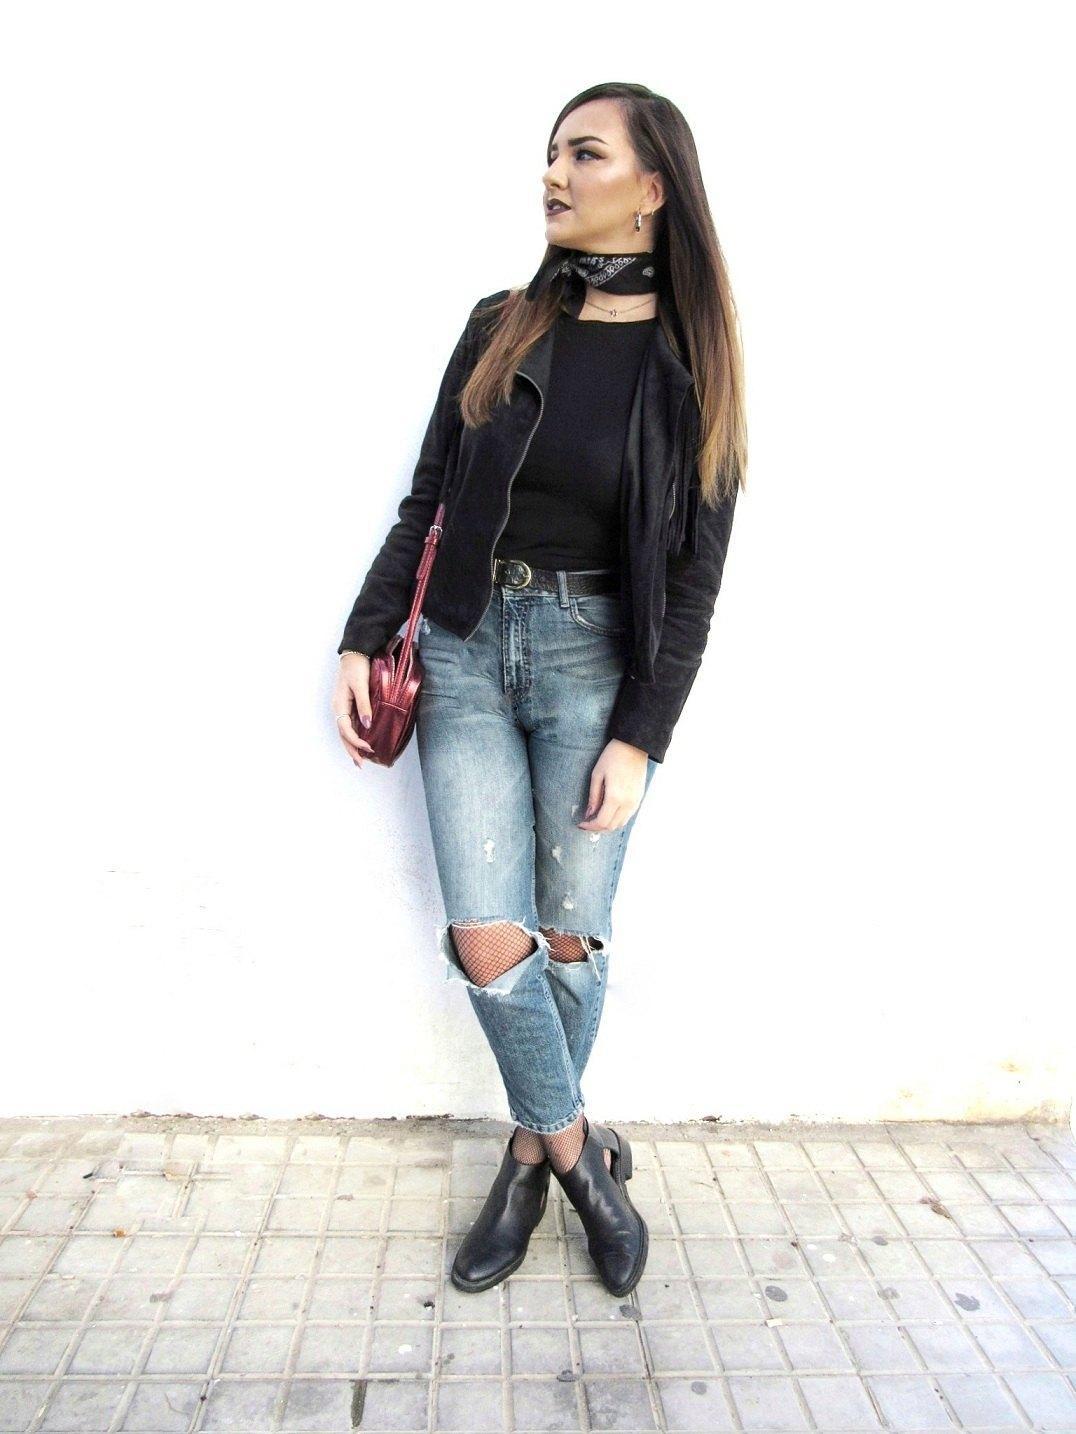 marikowskaya-street-style-patricia-ripped-jeans-2